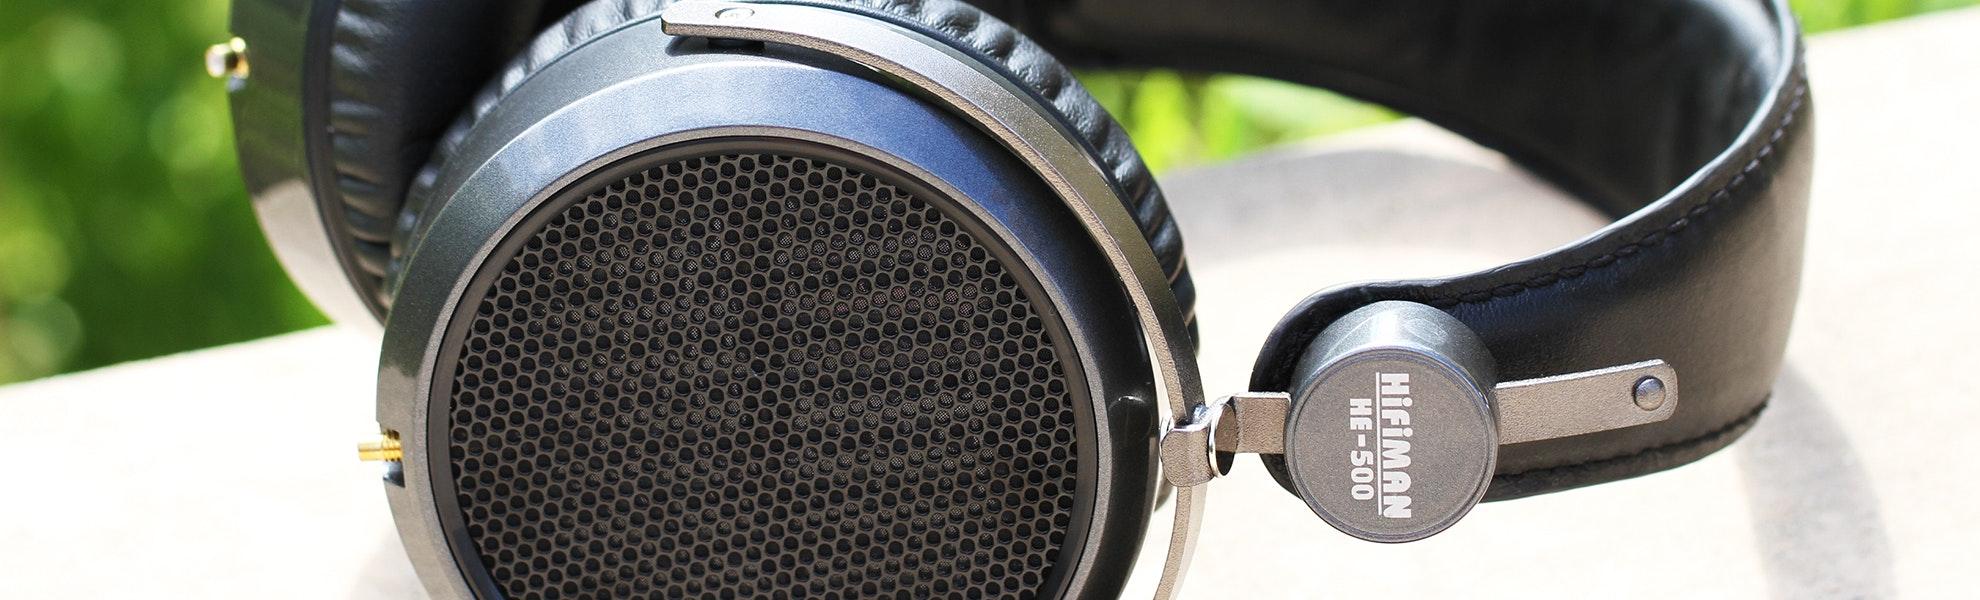 HiFiMan HE-500 Audiophile Headphones